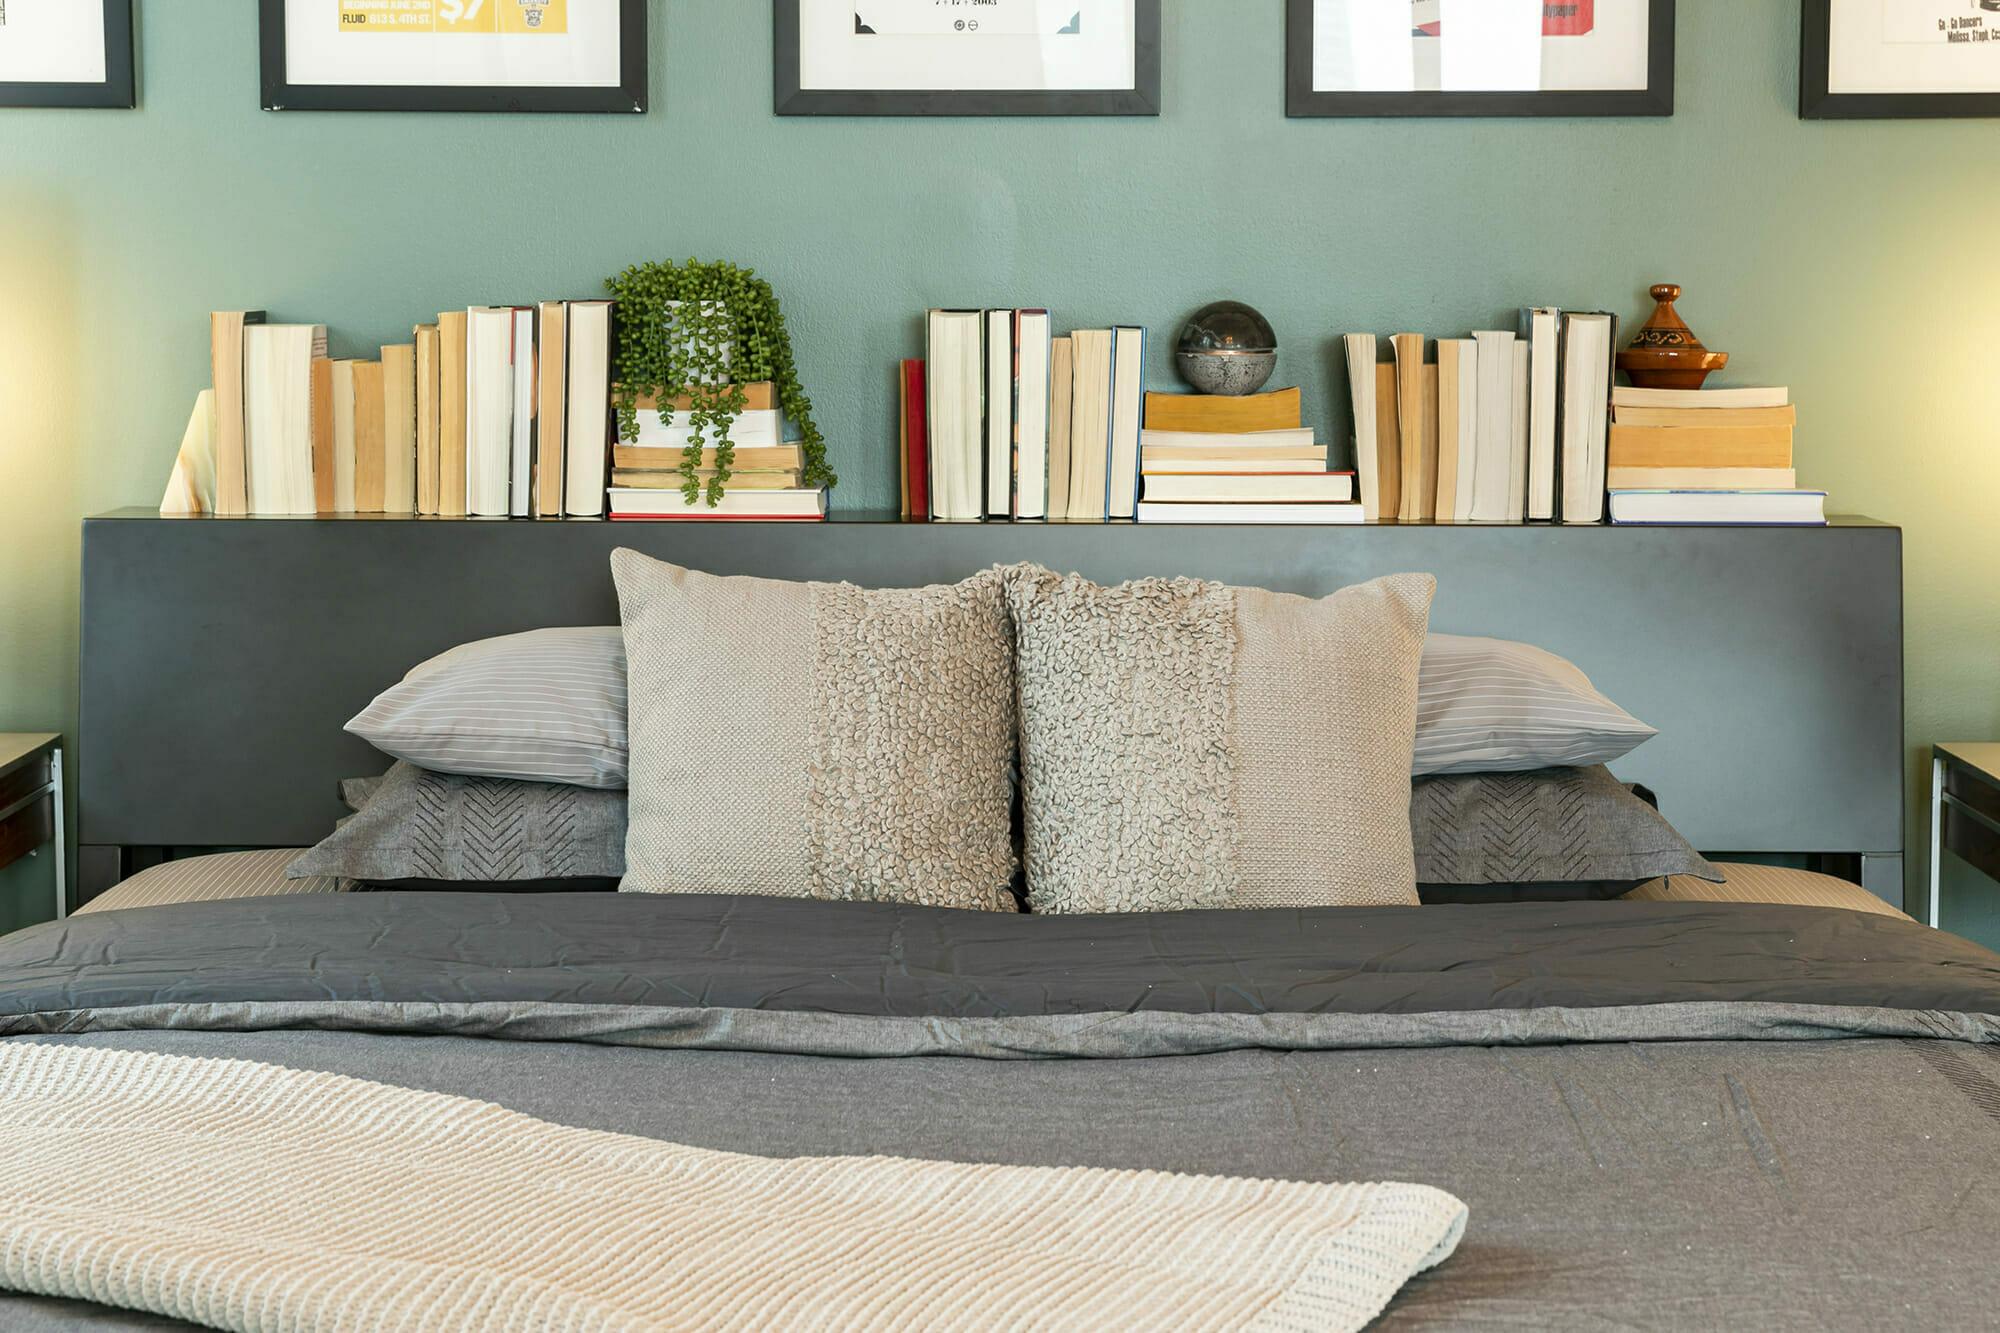 affordable-interior-decorator-decorilla-3d-rendering-bedroom-design